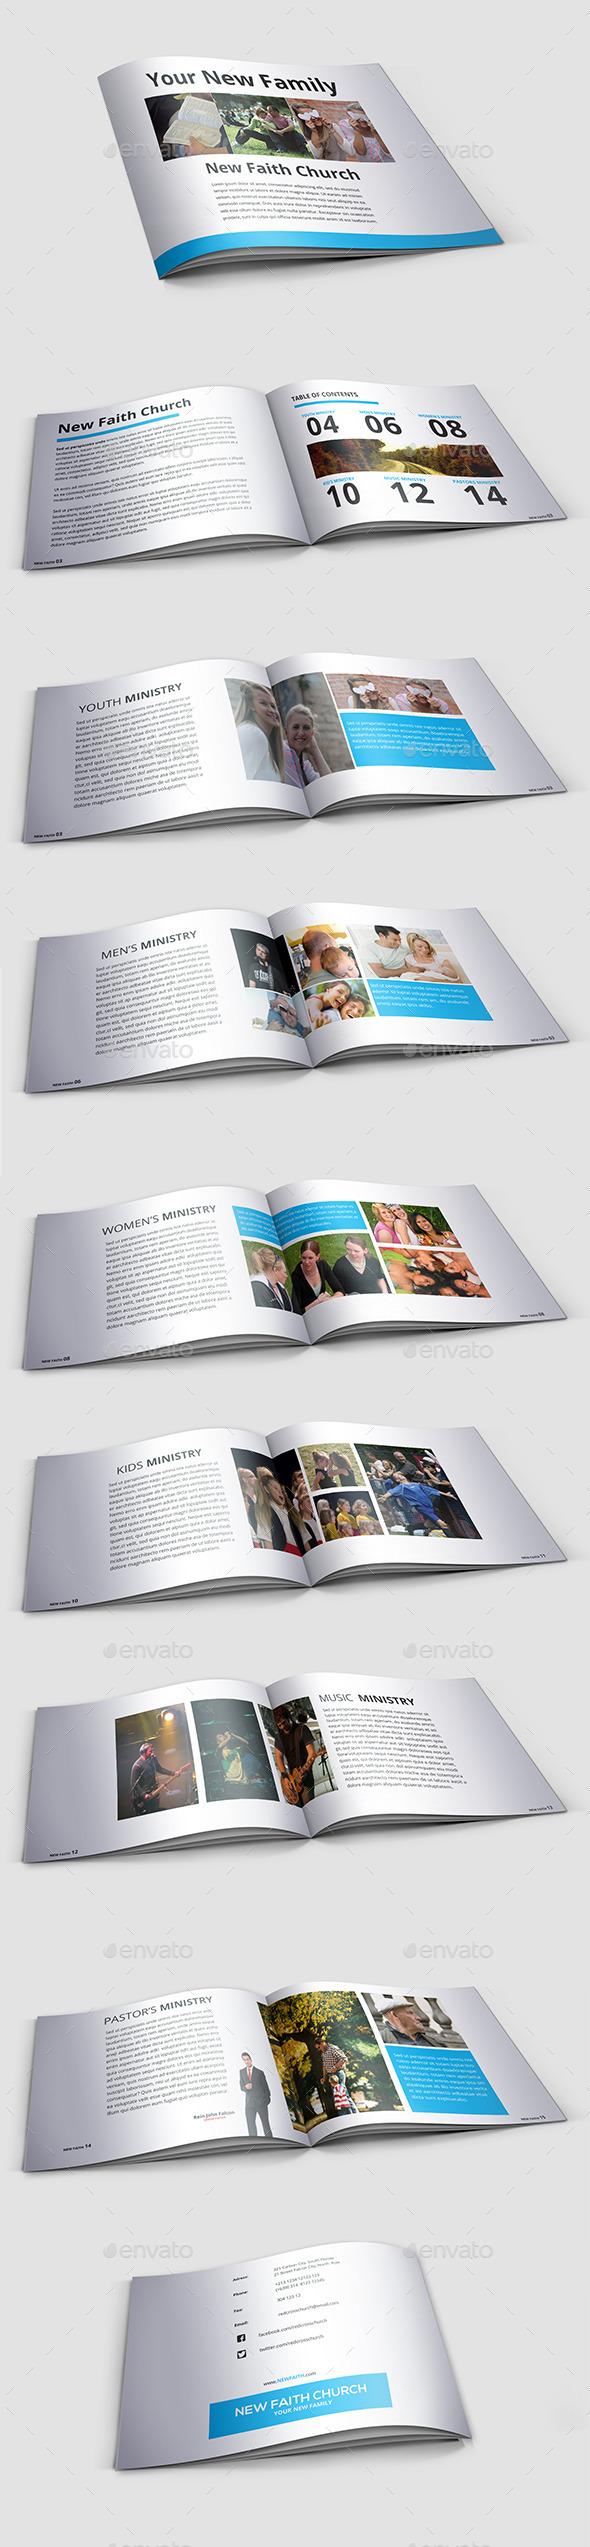 GraphicRiver Modern Minimal Church Brochure 9576331